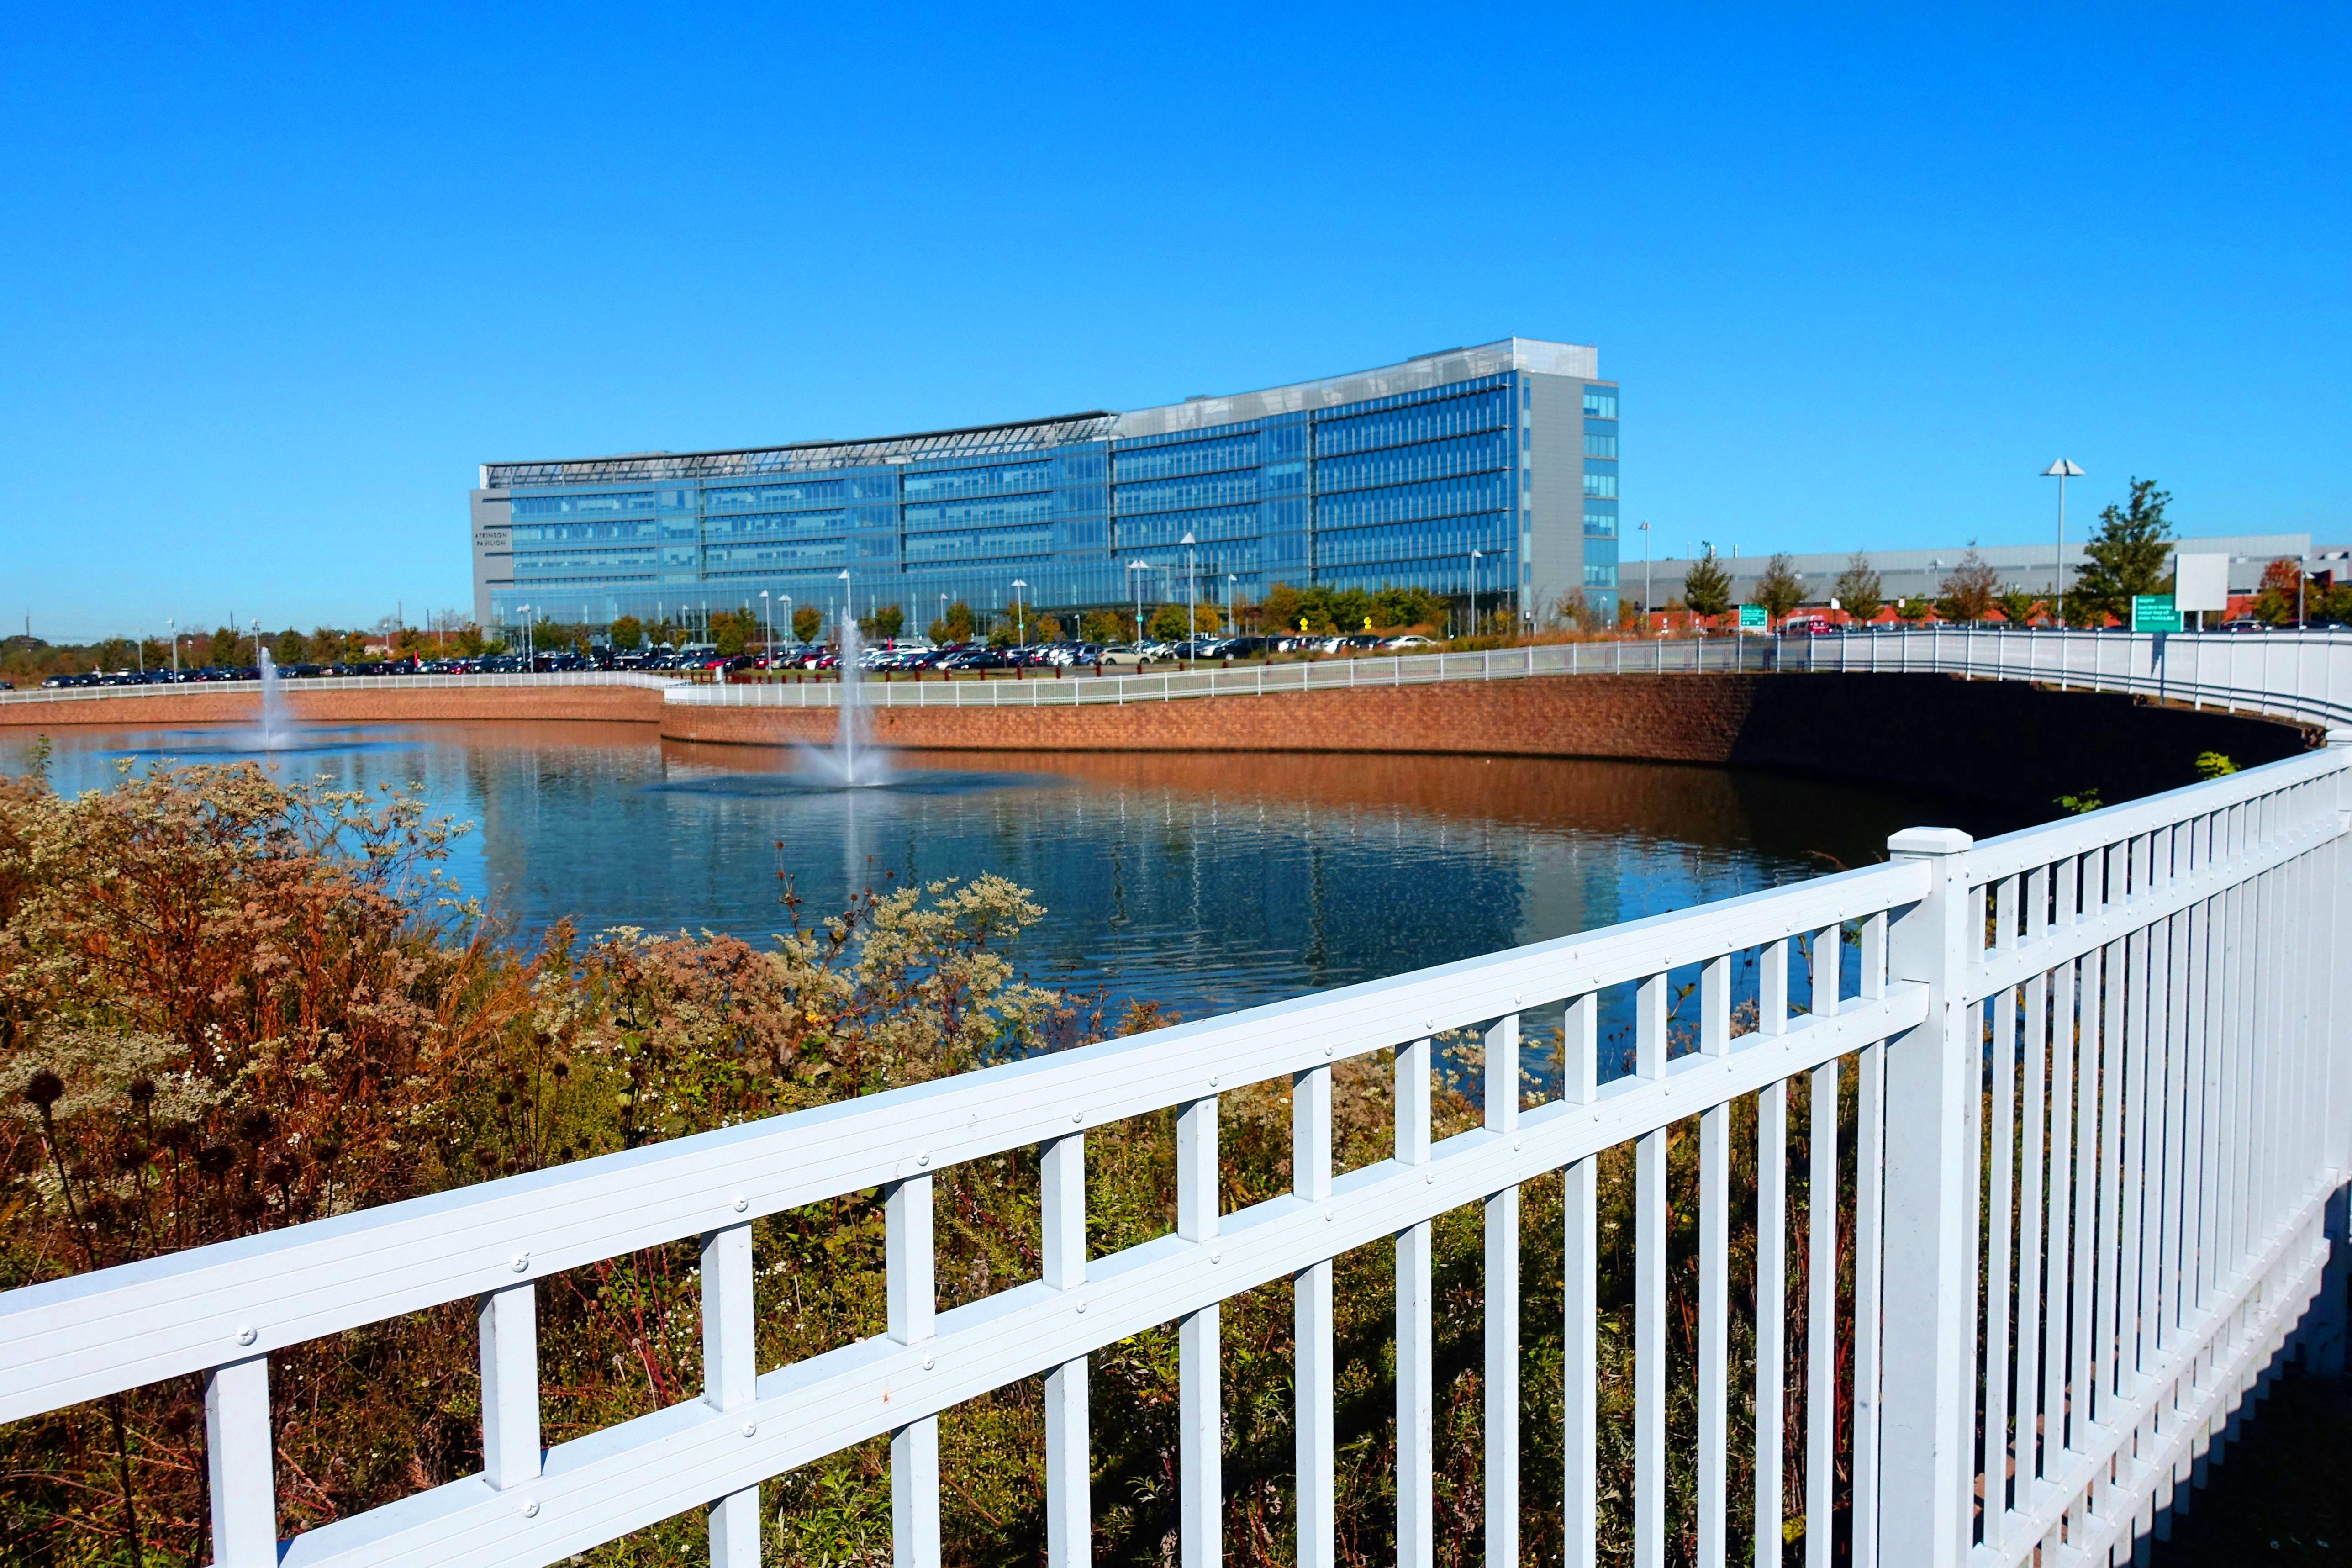 Plainsboro Princeton Hospital